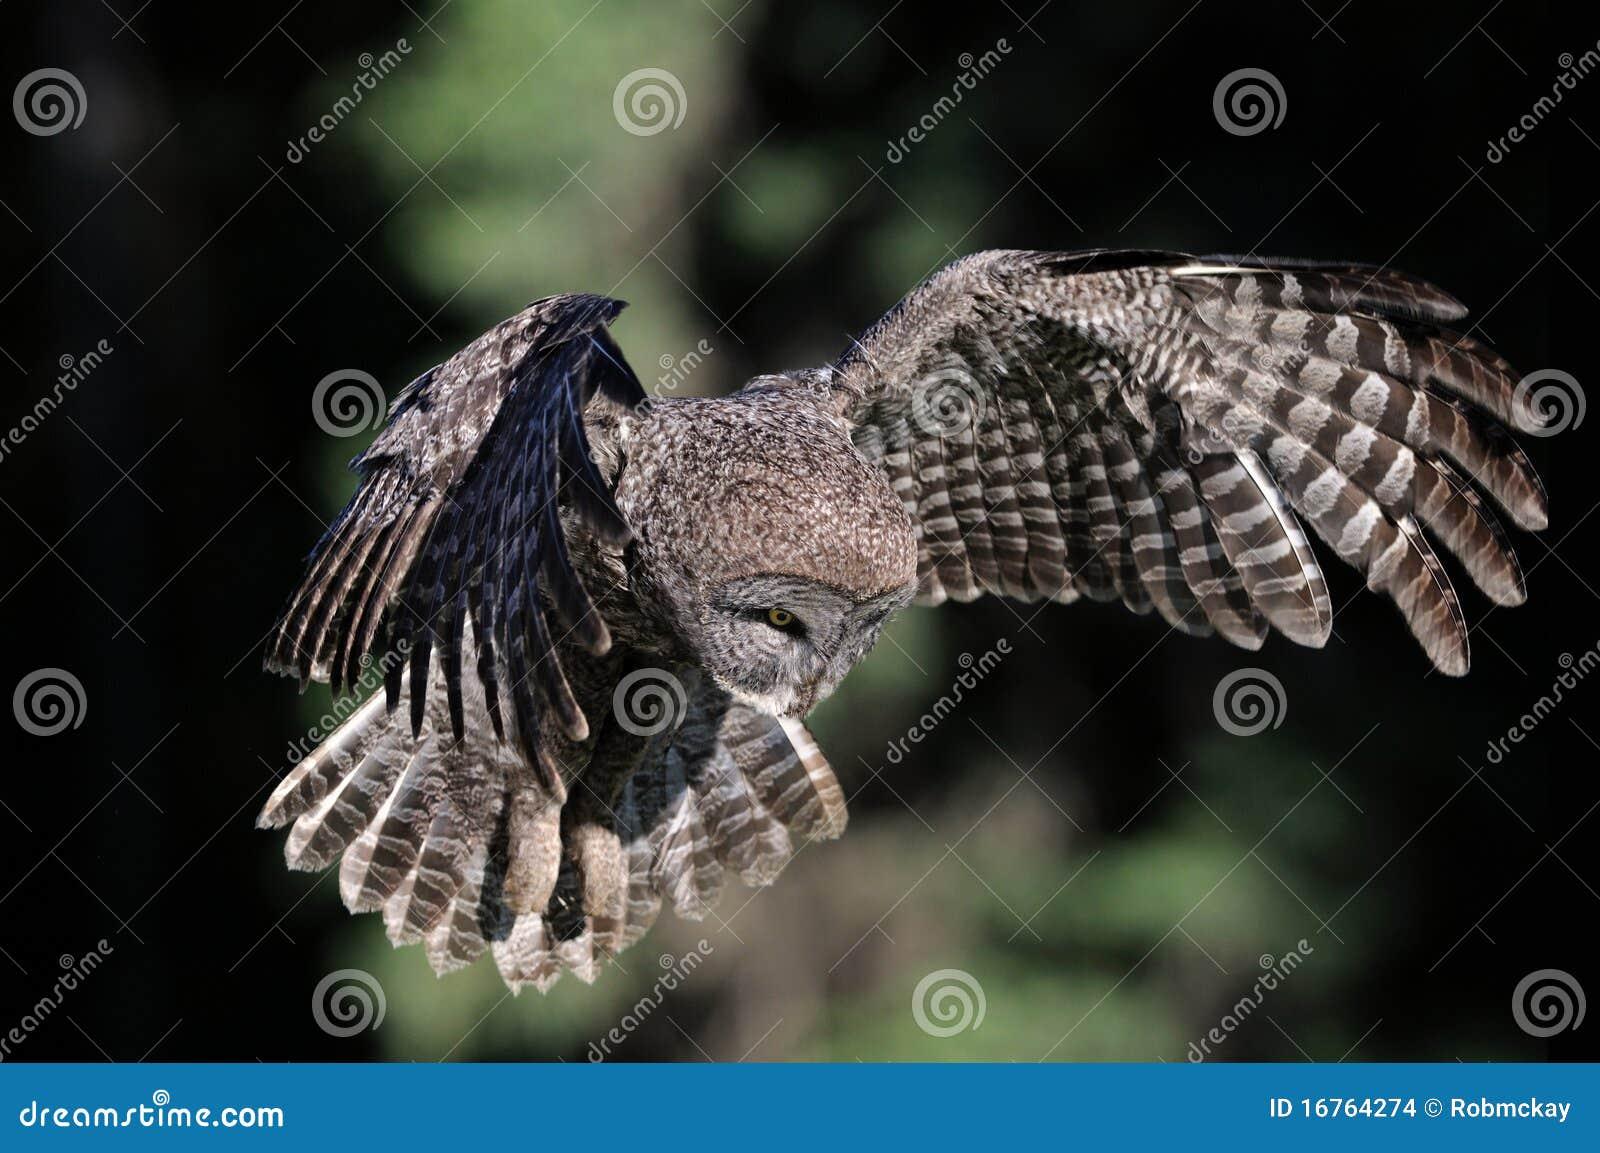 Great Grey Owl in-flight